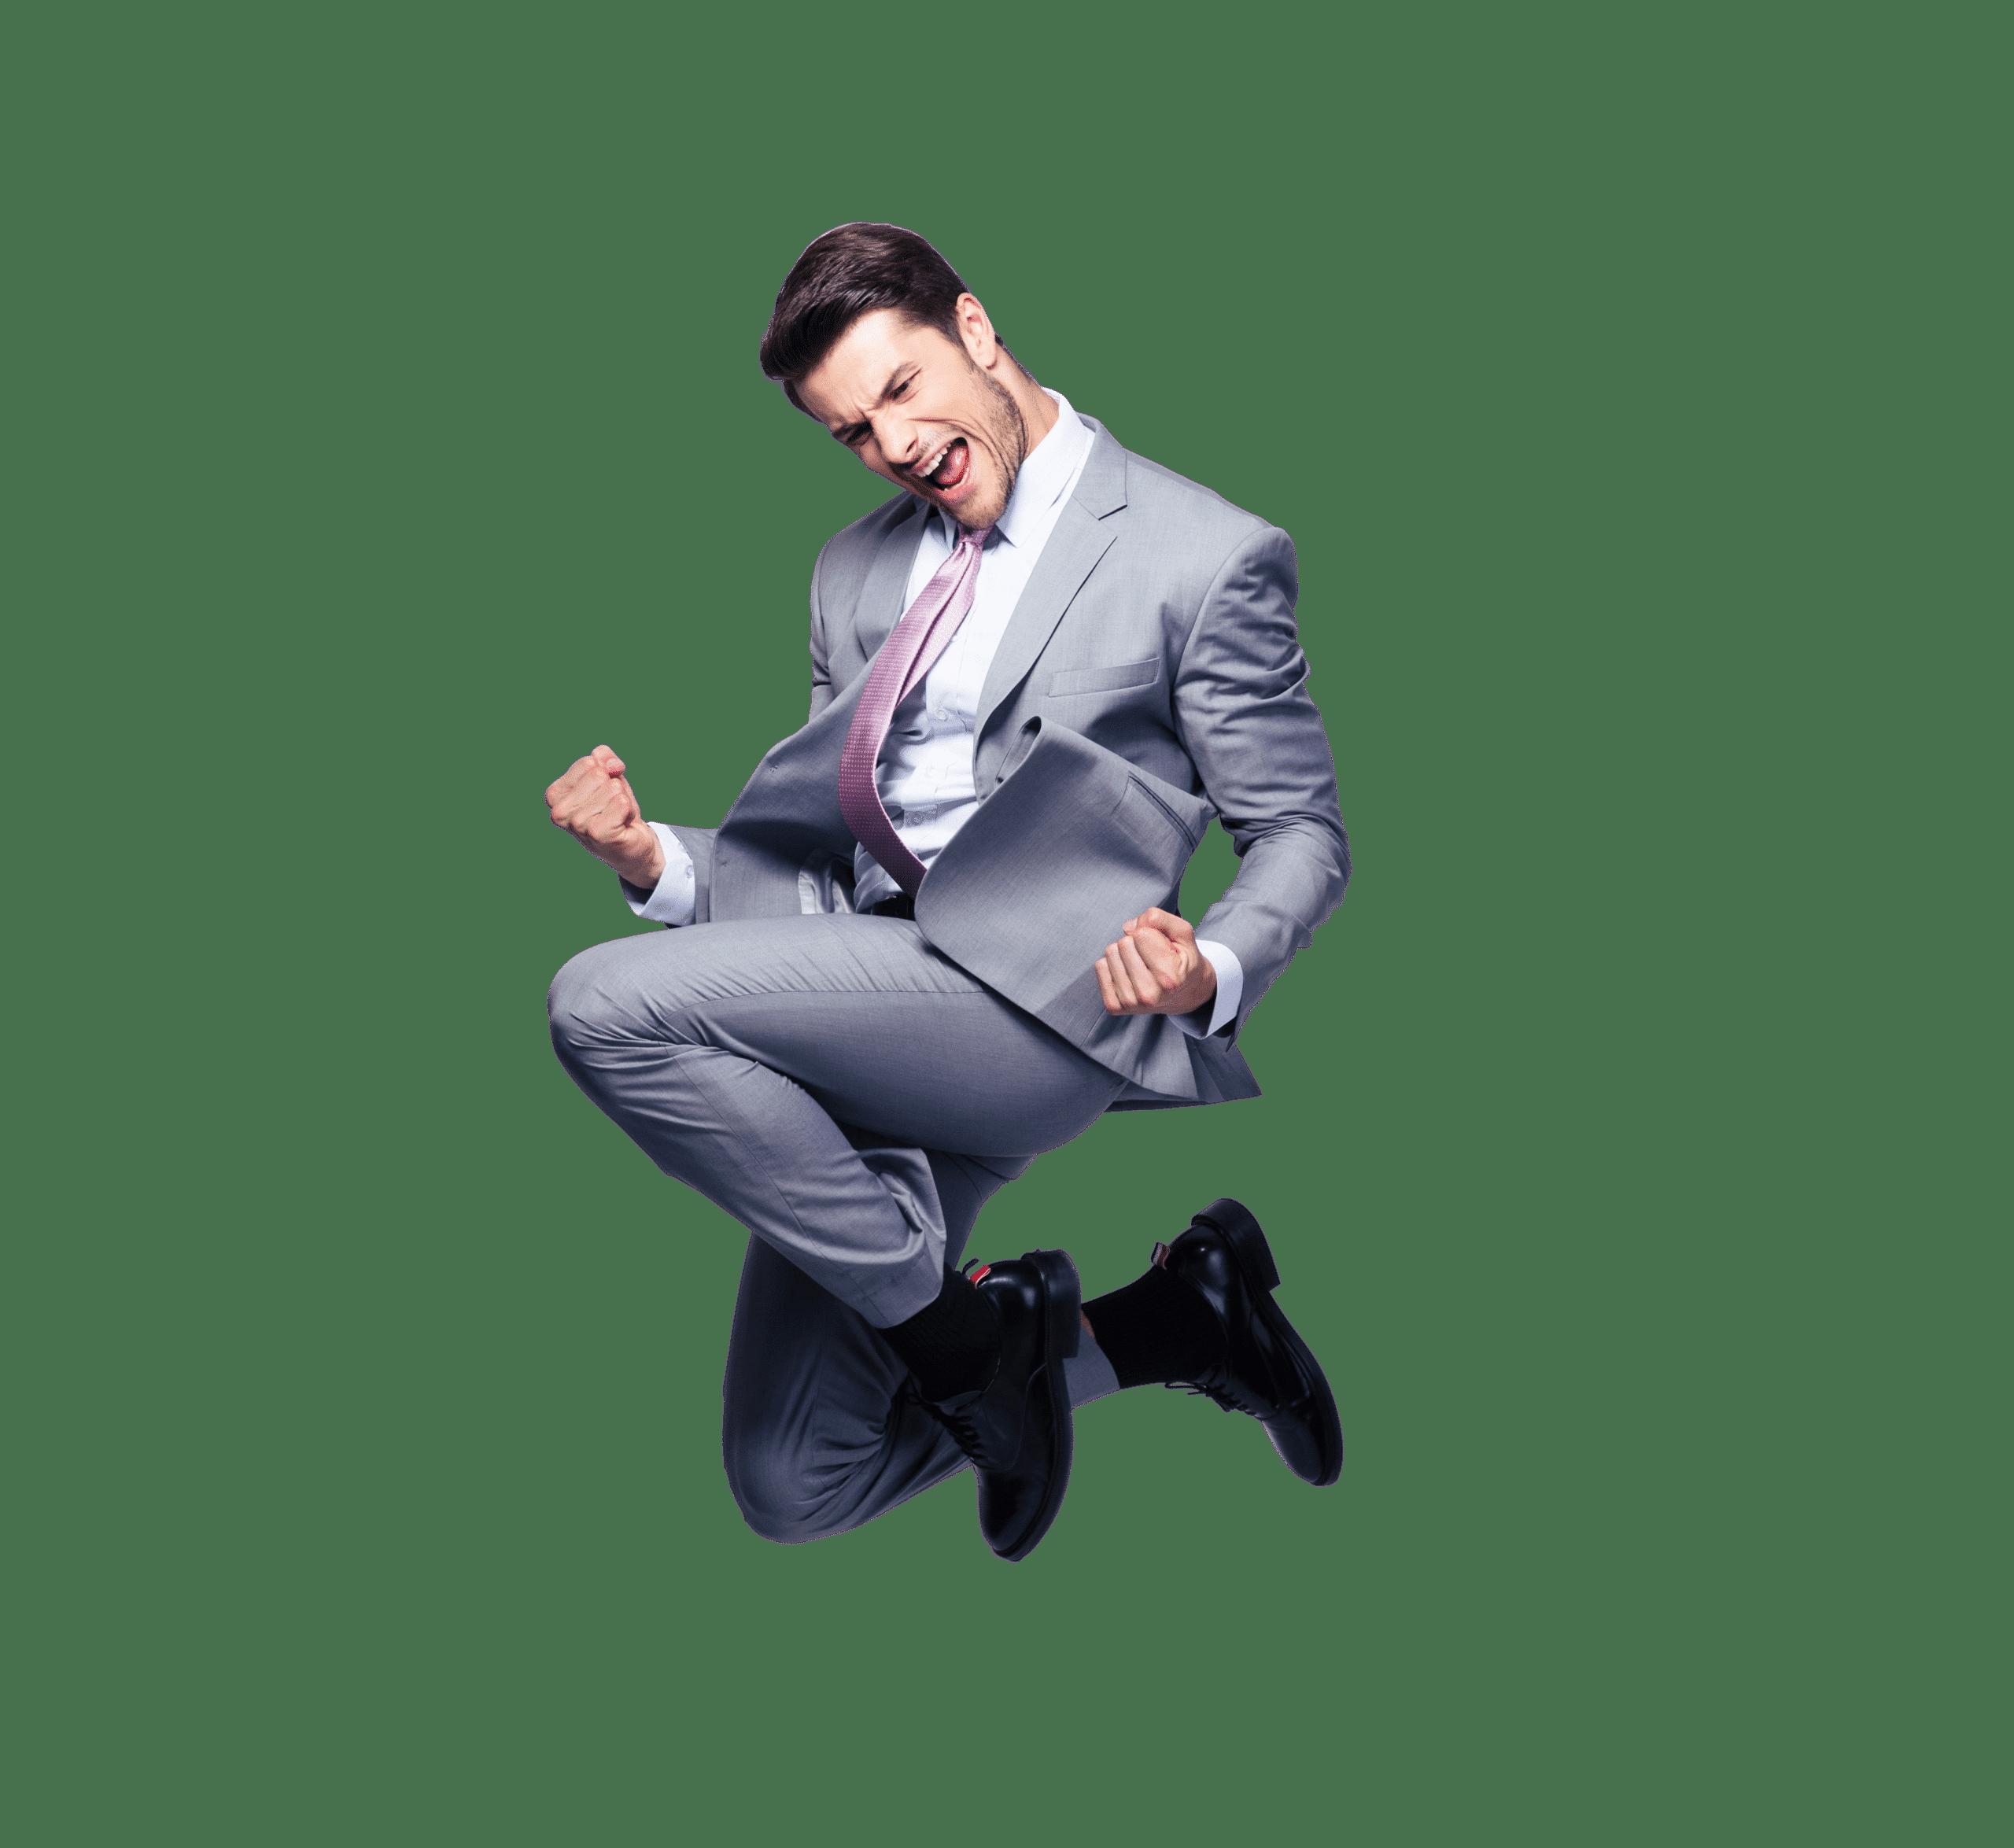 Happy_Businessman-removebg